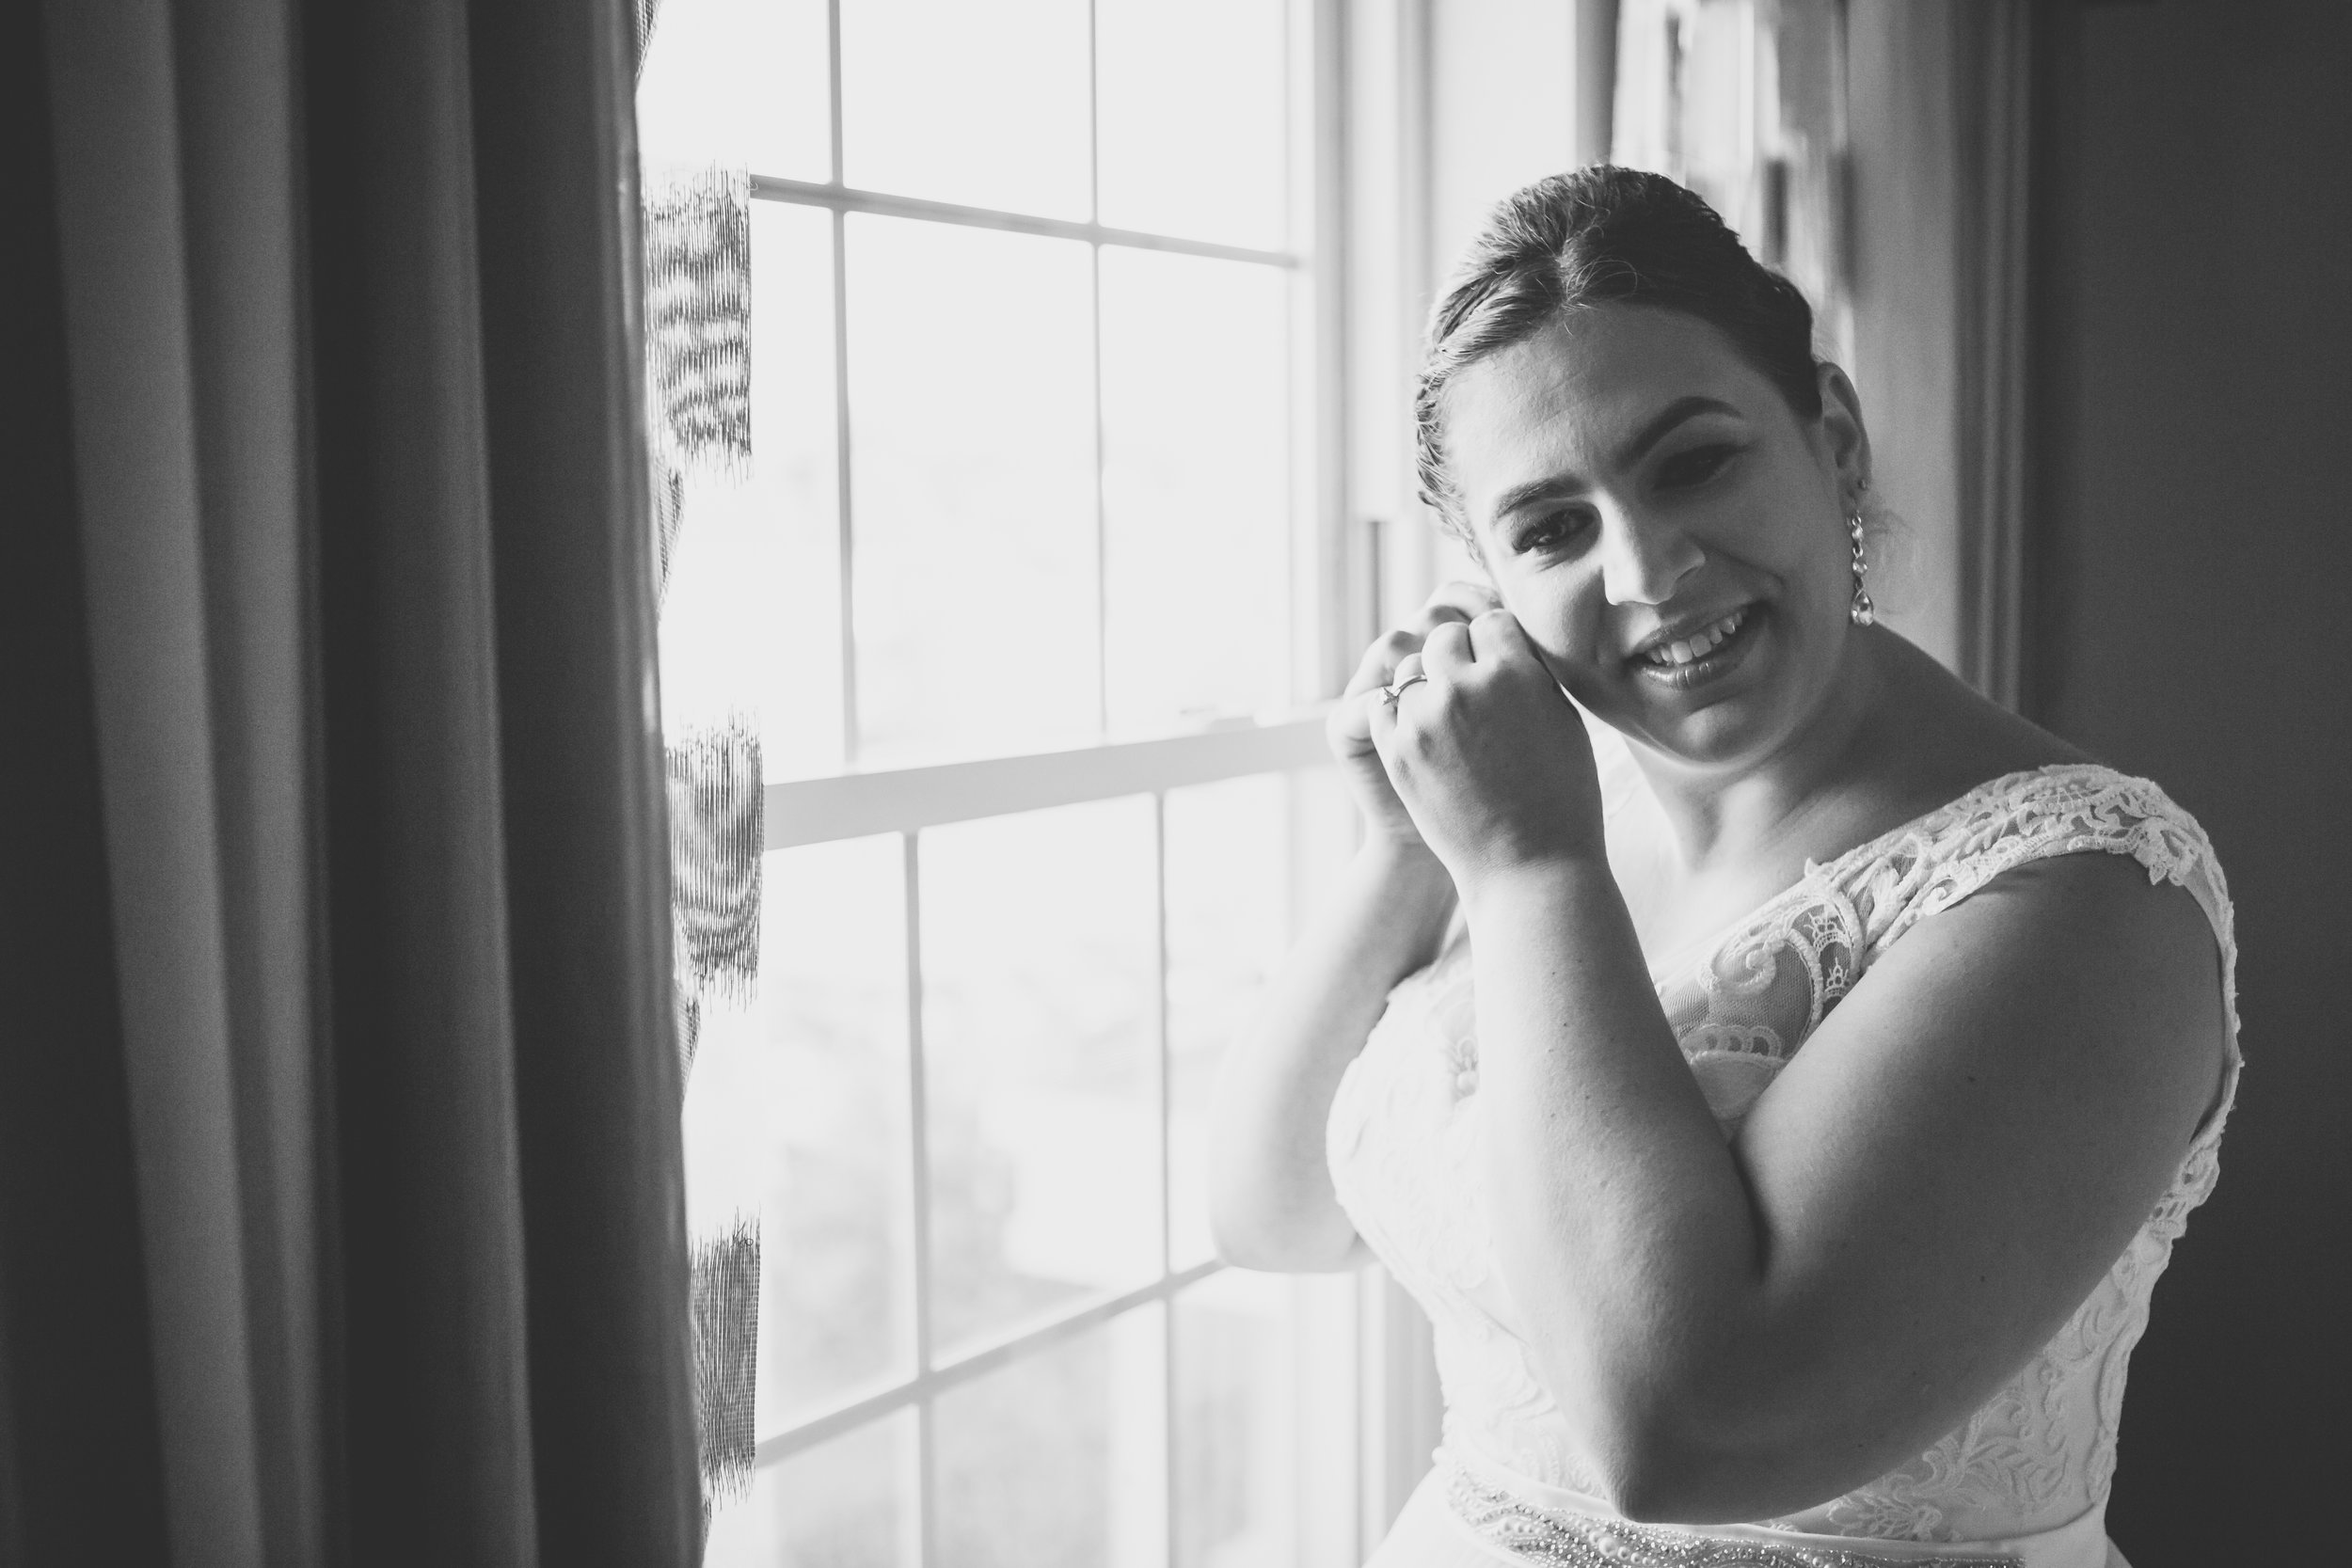 Bride puts on earrings - New Rochelle wedding - New York wedding - Hudson Valley wedding - Heather & Ian's wedding - Amy Sims Photography